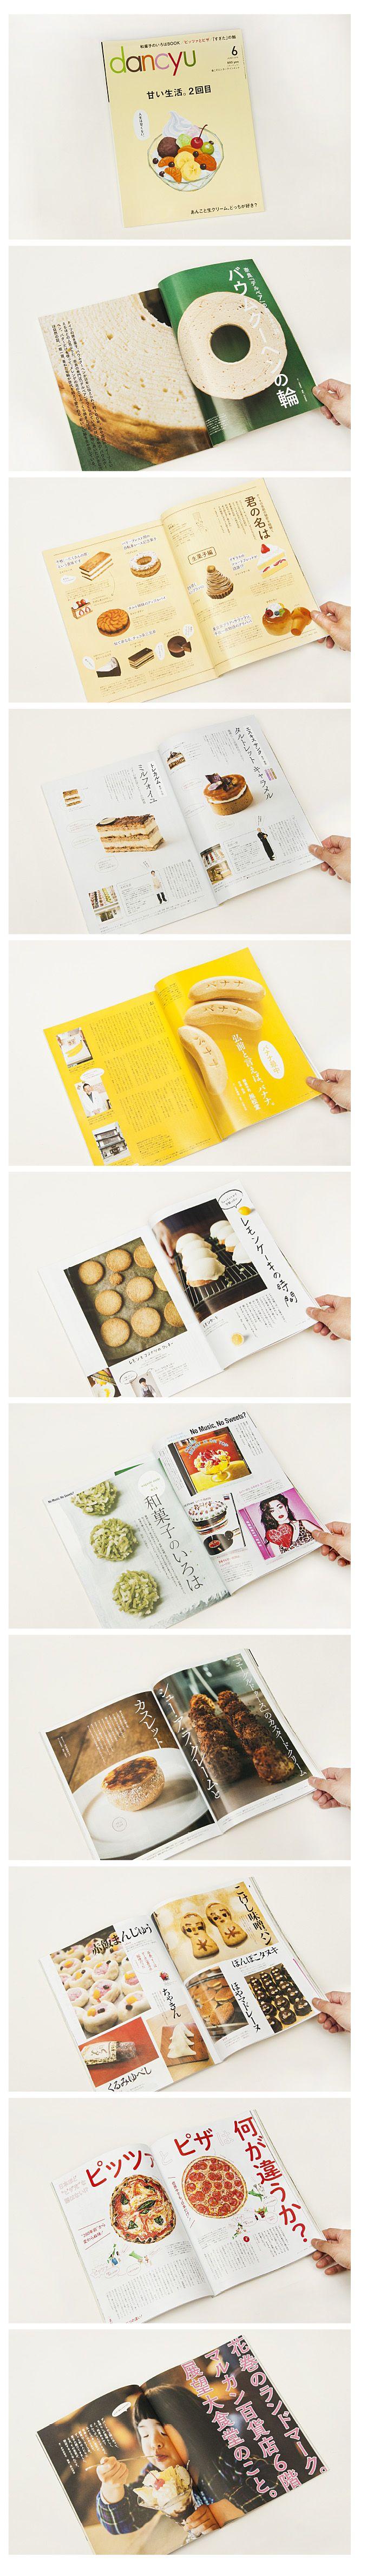 Best 25+ Magazine format ideas on Pinterest | Magazine layouts ...